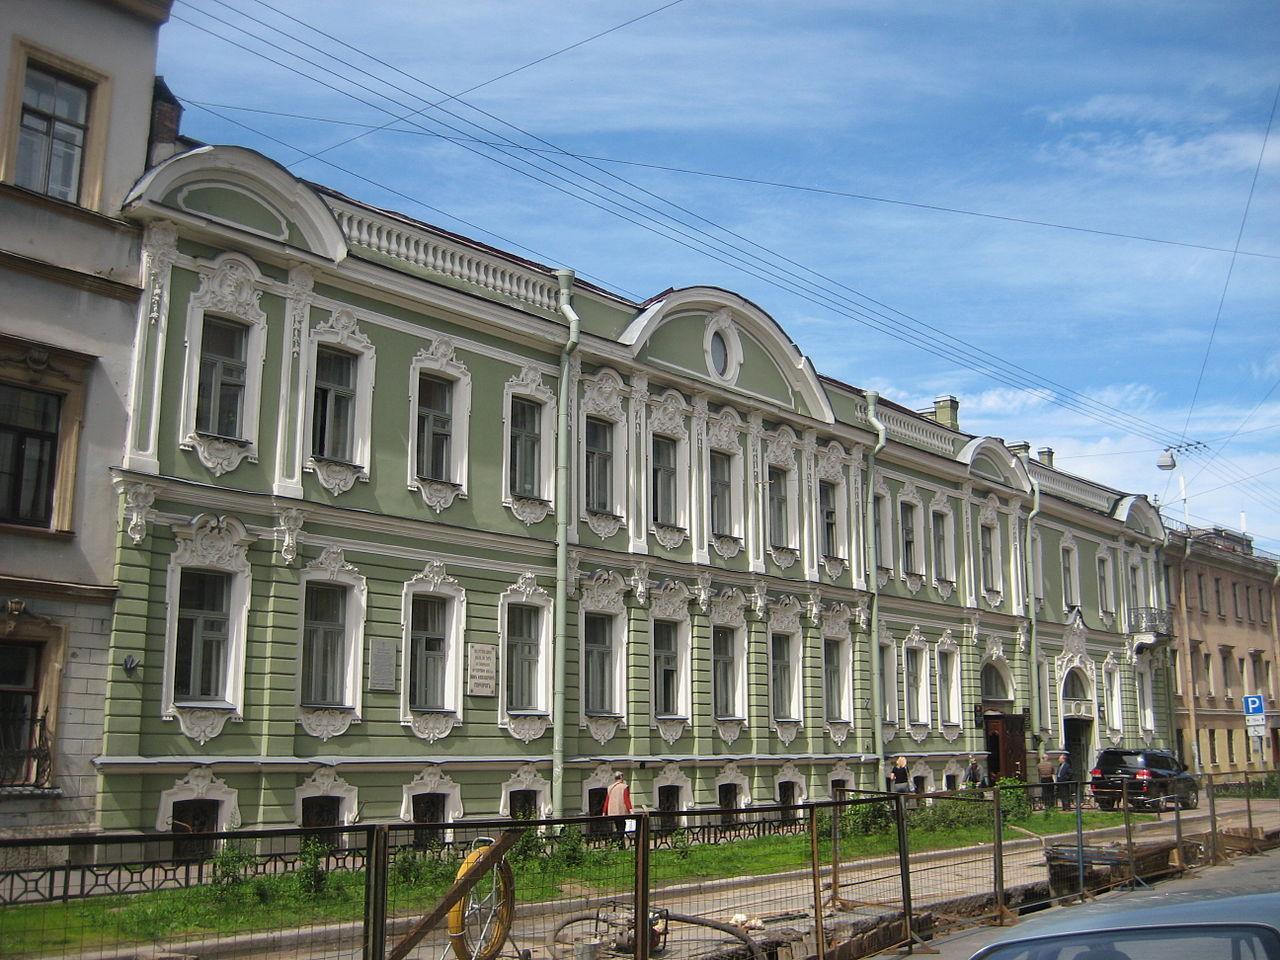 Особняк М. М. Устинова. Моховая, 3. Фото: Skydrinker (Wikimedia Commons)